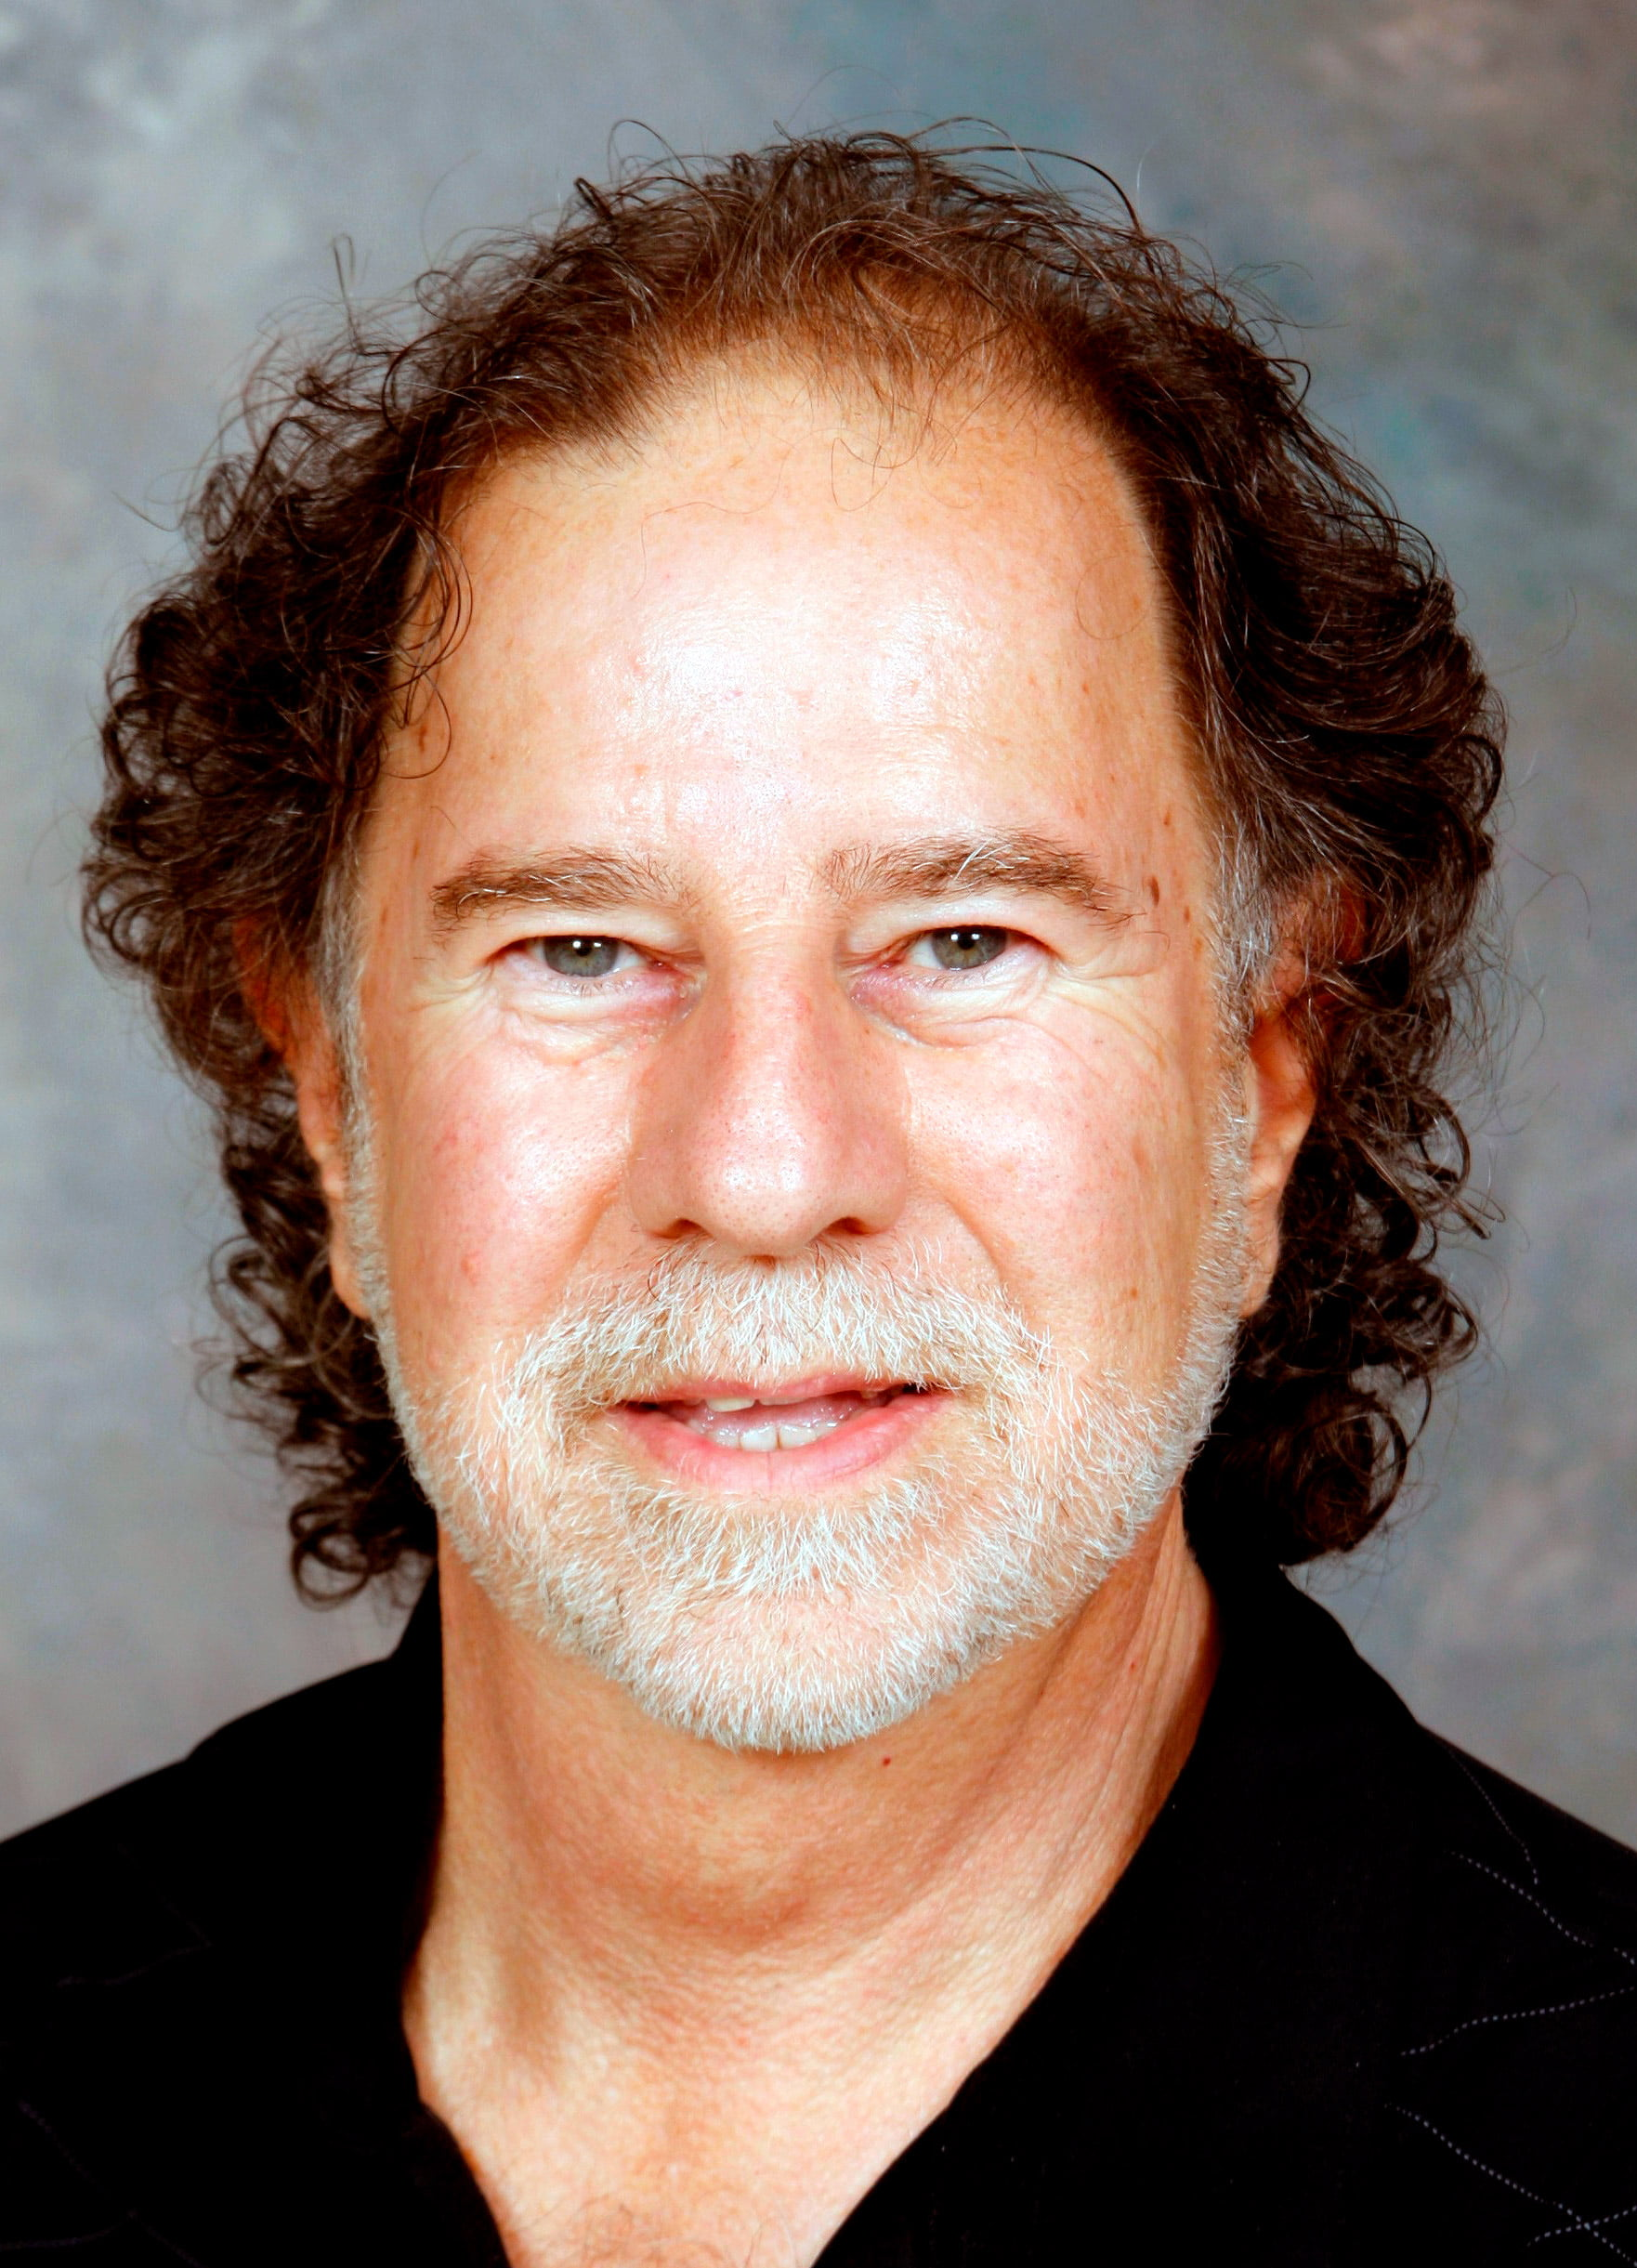 John Nolasco